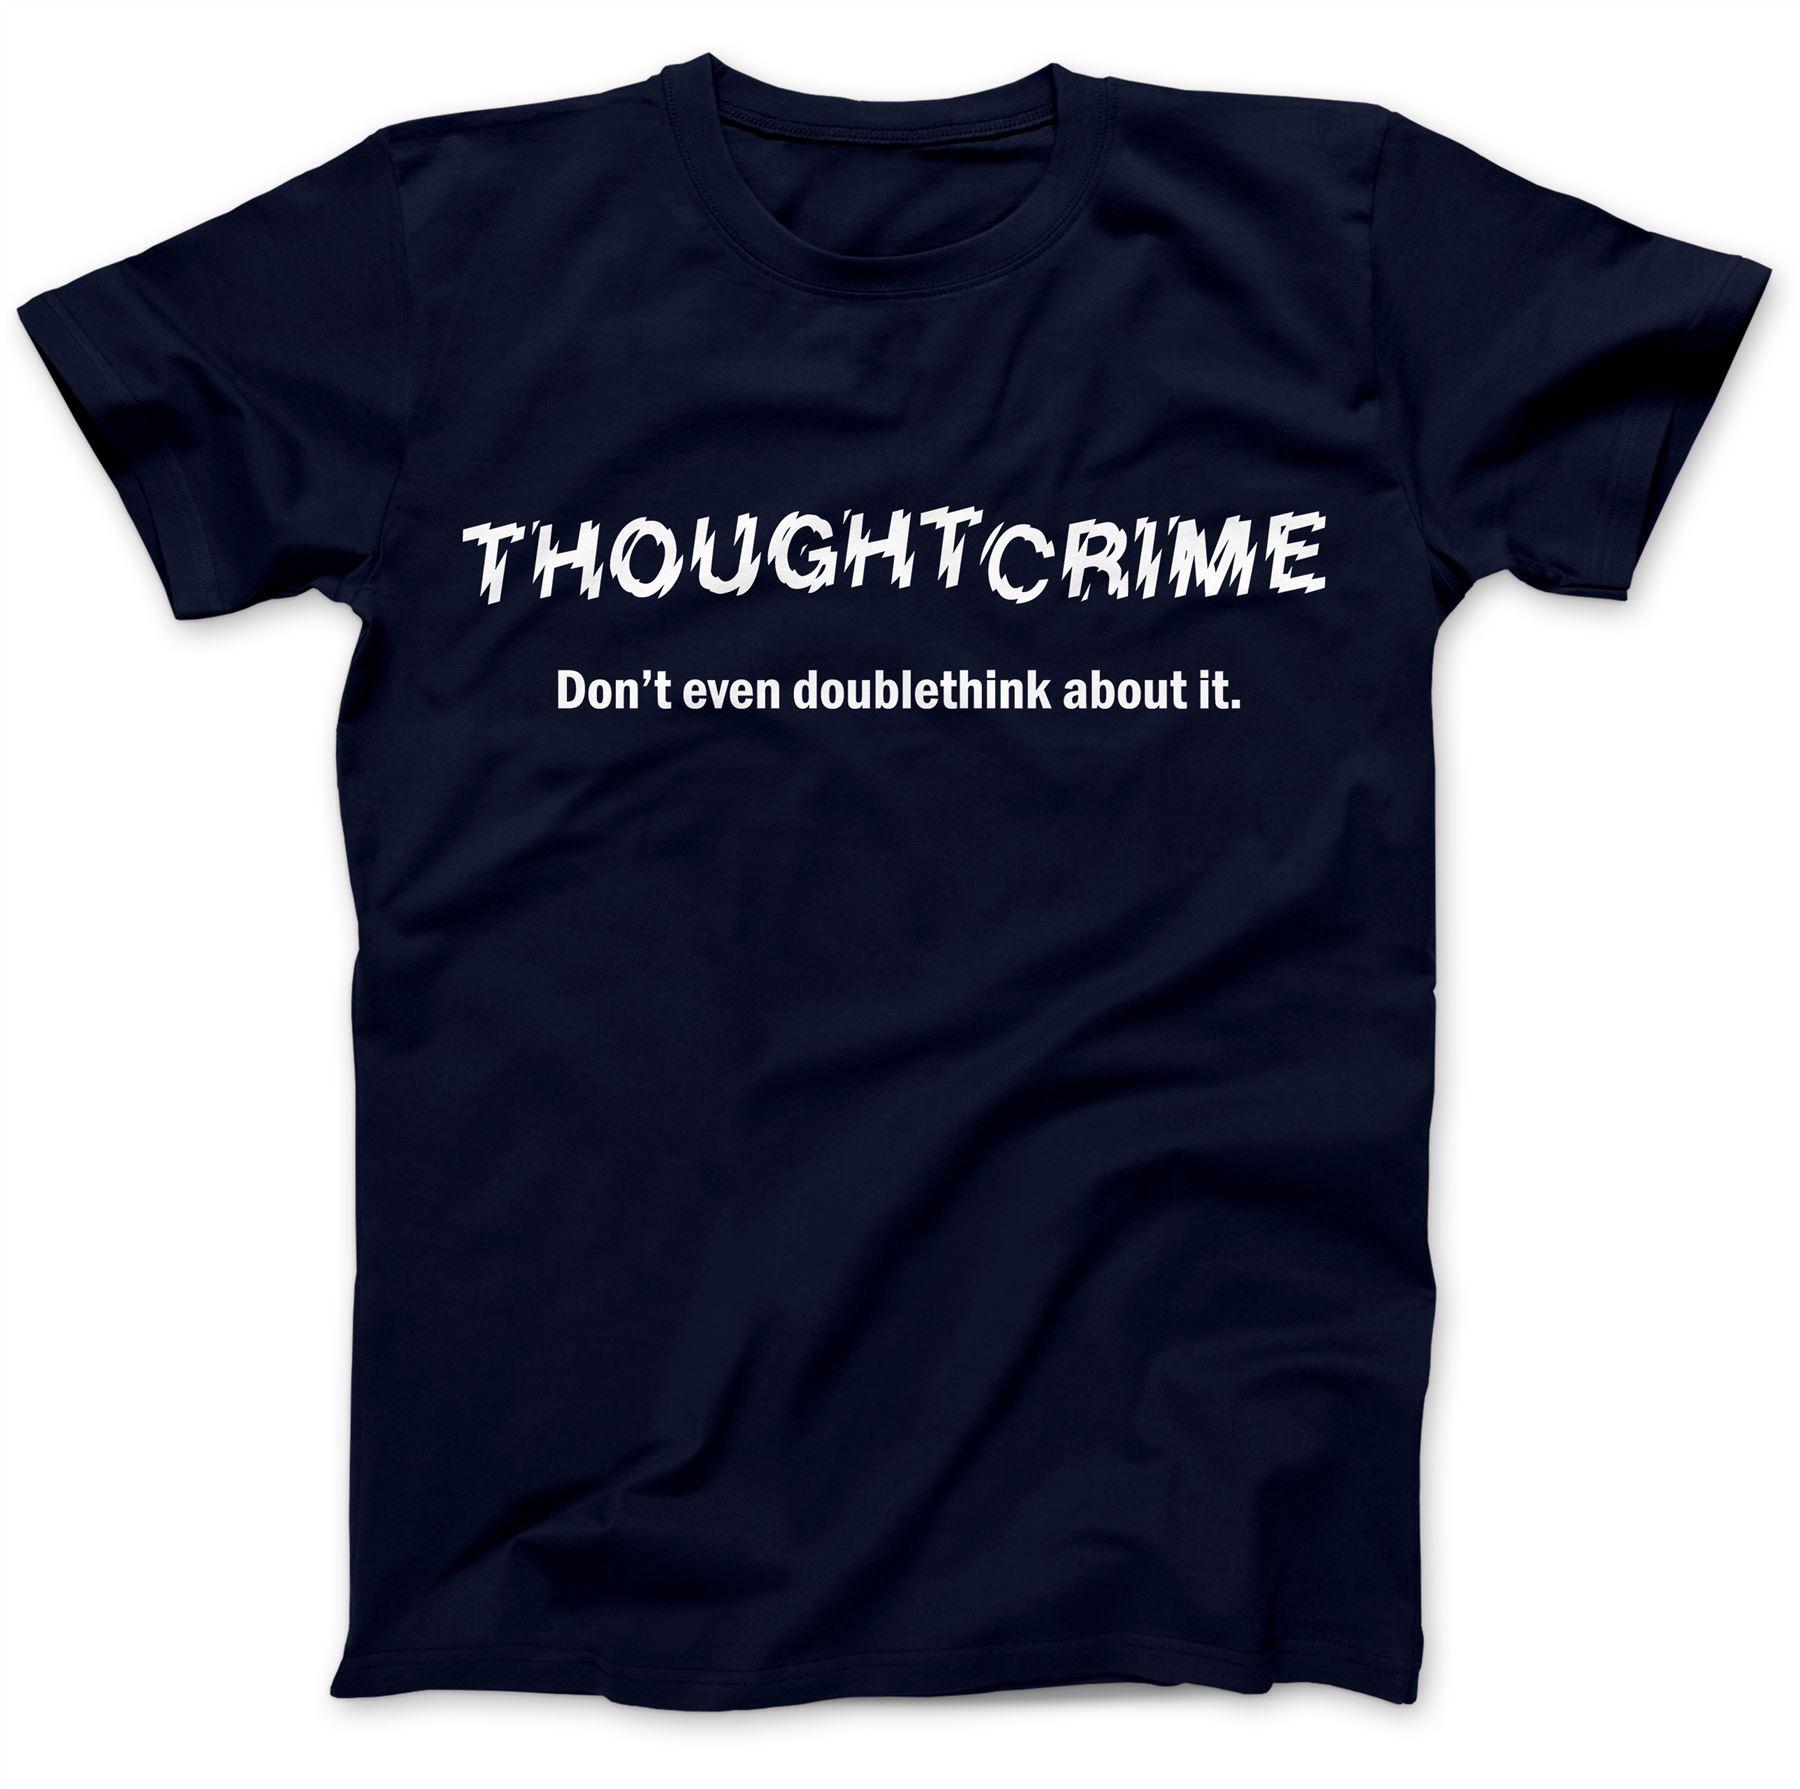 1984-Thought-Crime-George-Orwell-T-Shirt-100-Premium-Cotton-Animal-Farm miniatuur 16